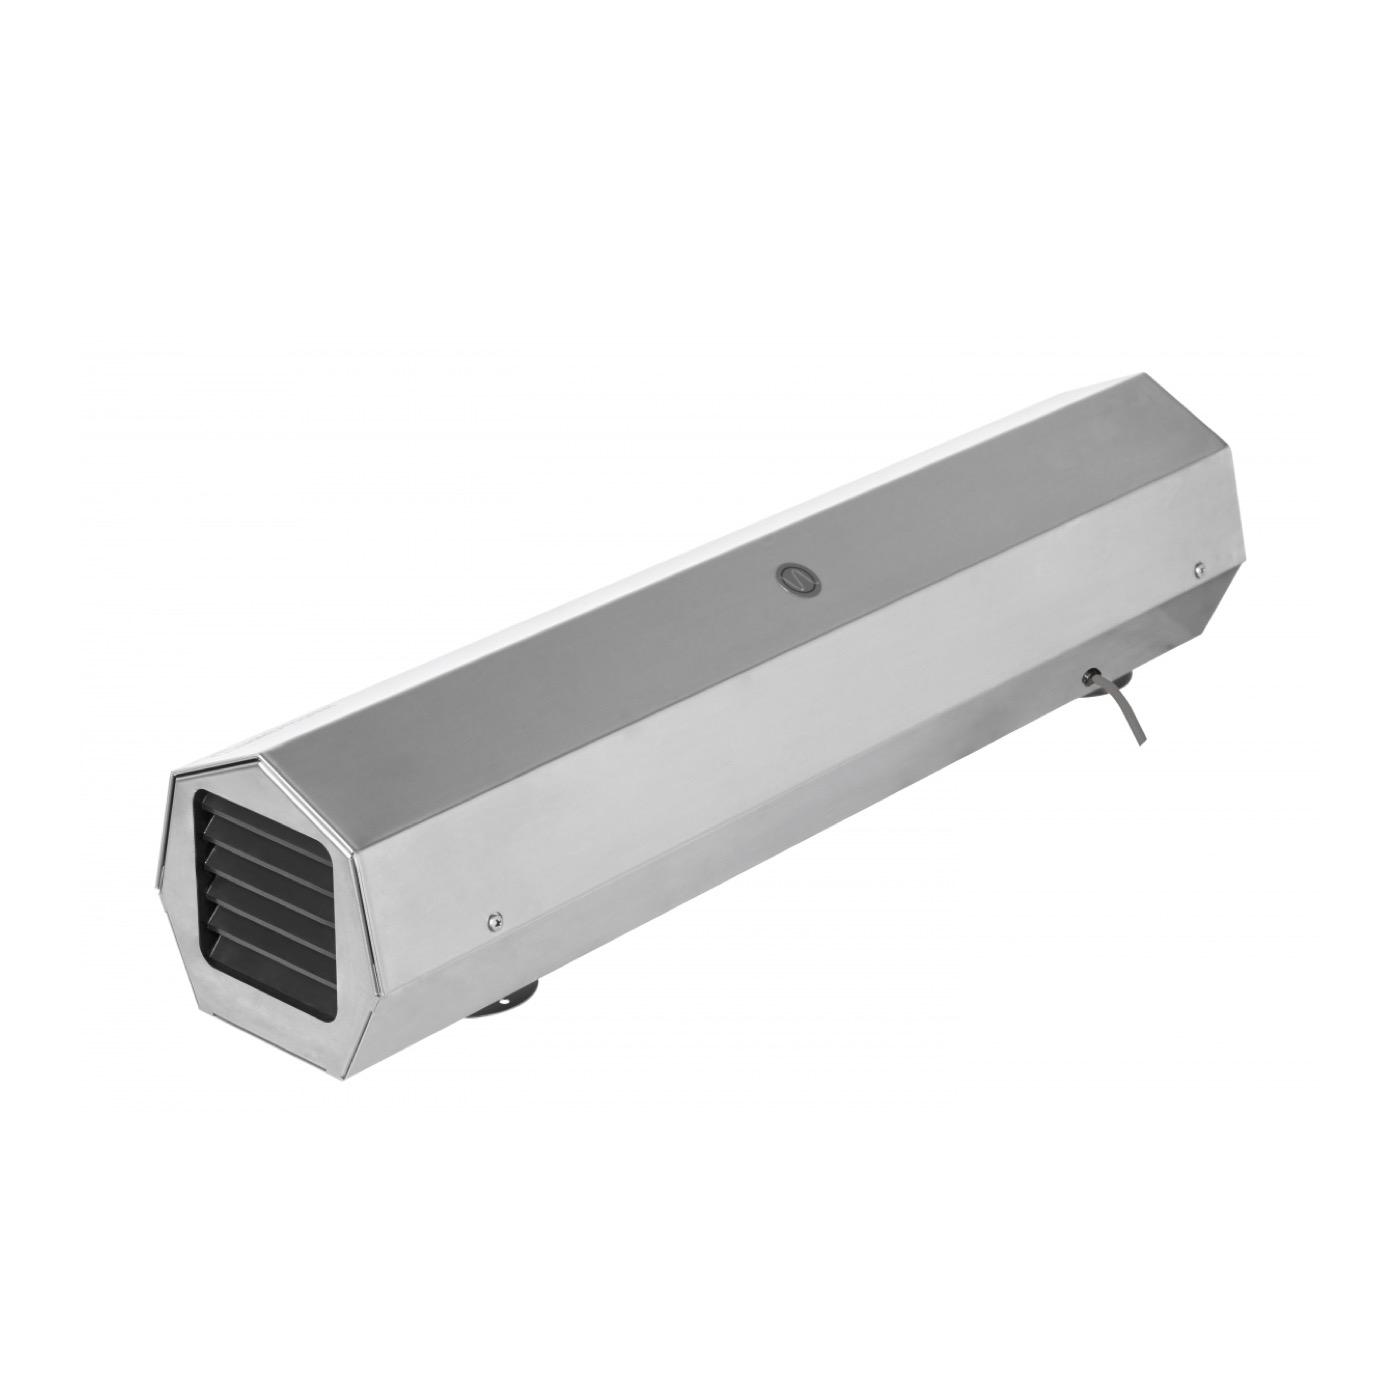 UVC-FAN-XS oro valymo įrenginys